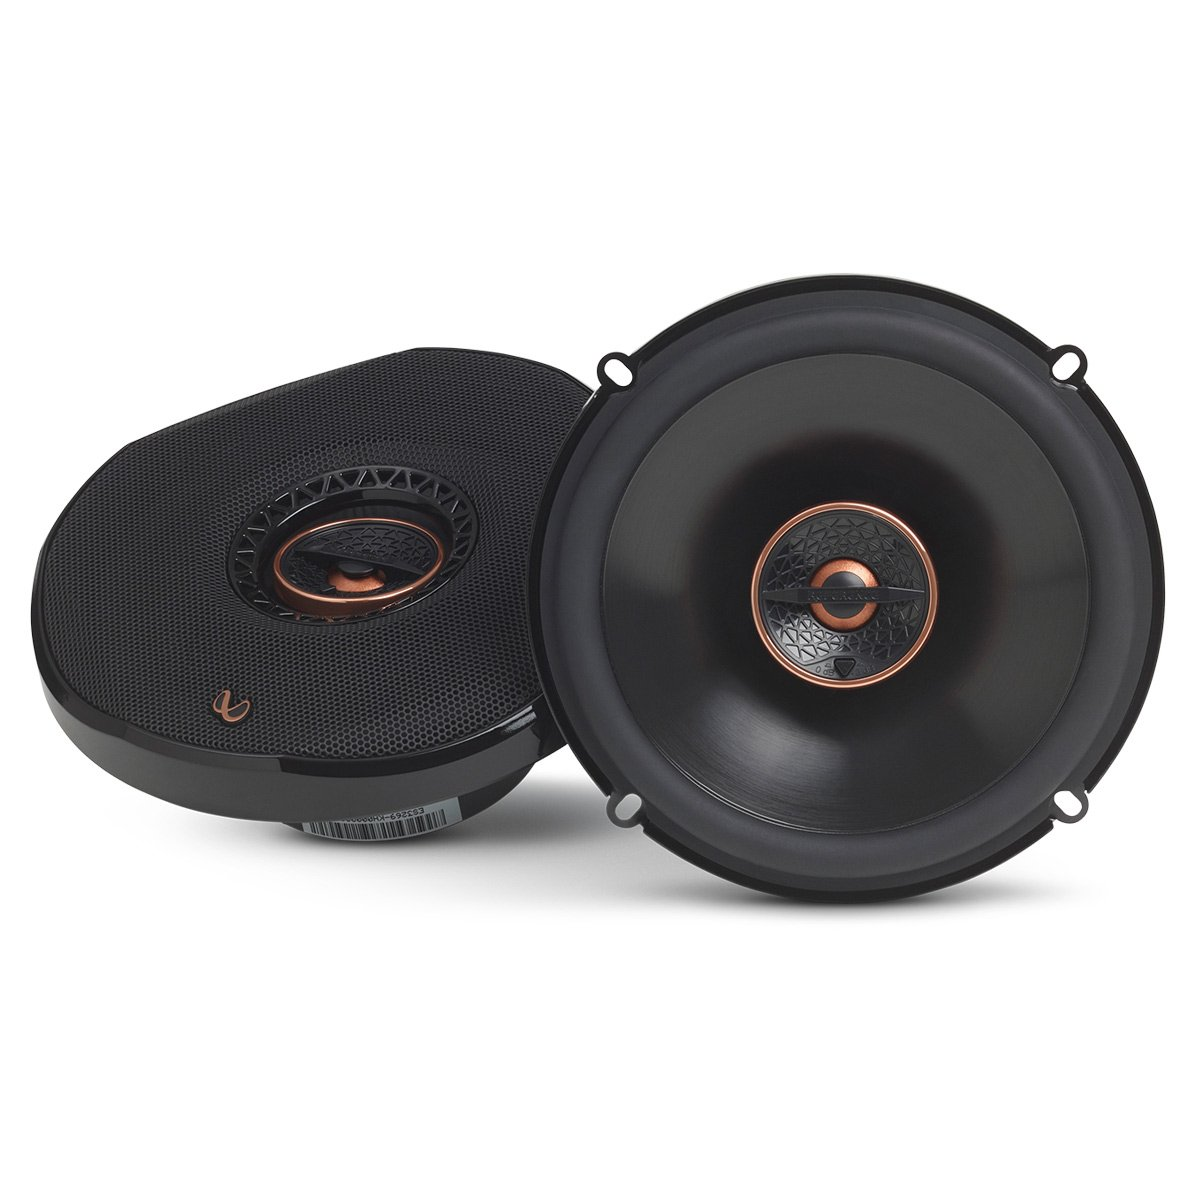 "Infinity Reference 6532IX 6-1/2"" 2-way Car Speakers - Pair"